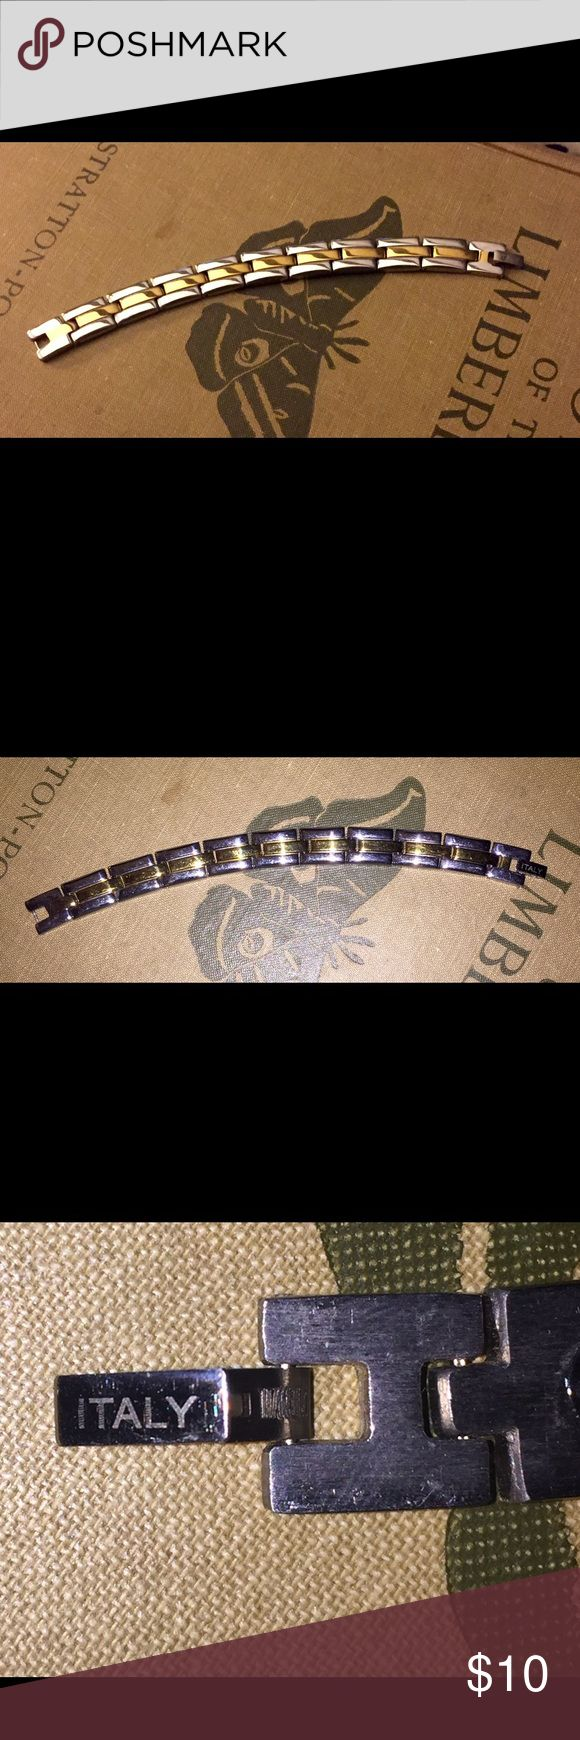 Titanium ITALY Bracelet Titanium bracelet marked titanium Italy on the clasp. Great condition.  6.5 in long Jewelry Bracelets